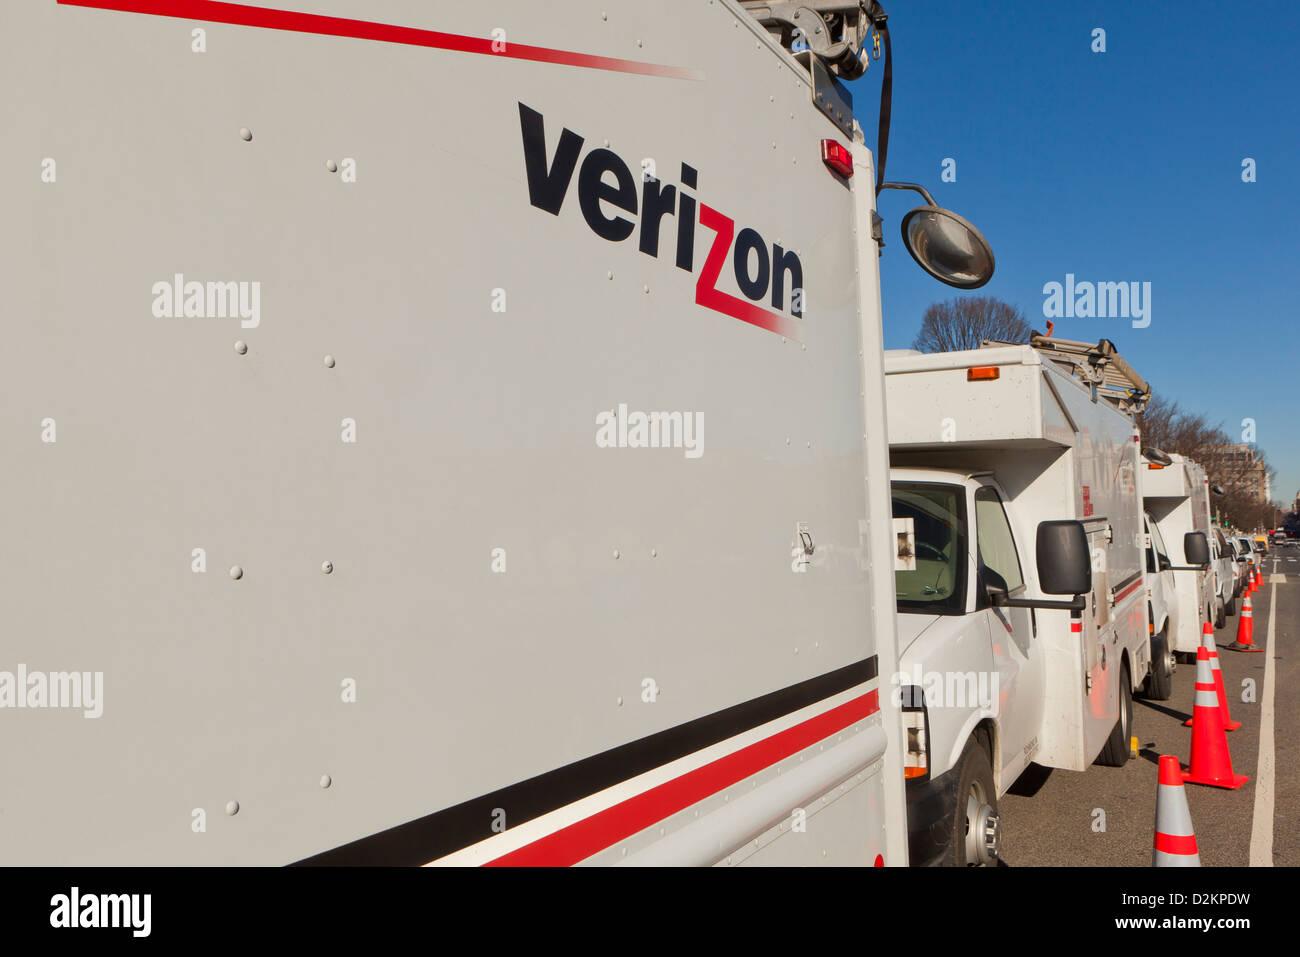 Verizon service trucks parked - Stock Image